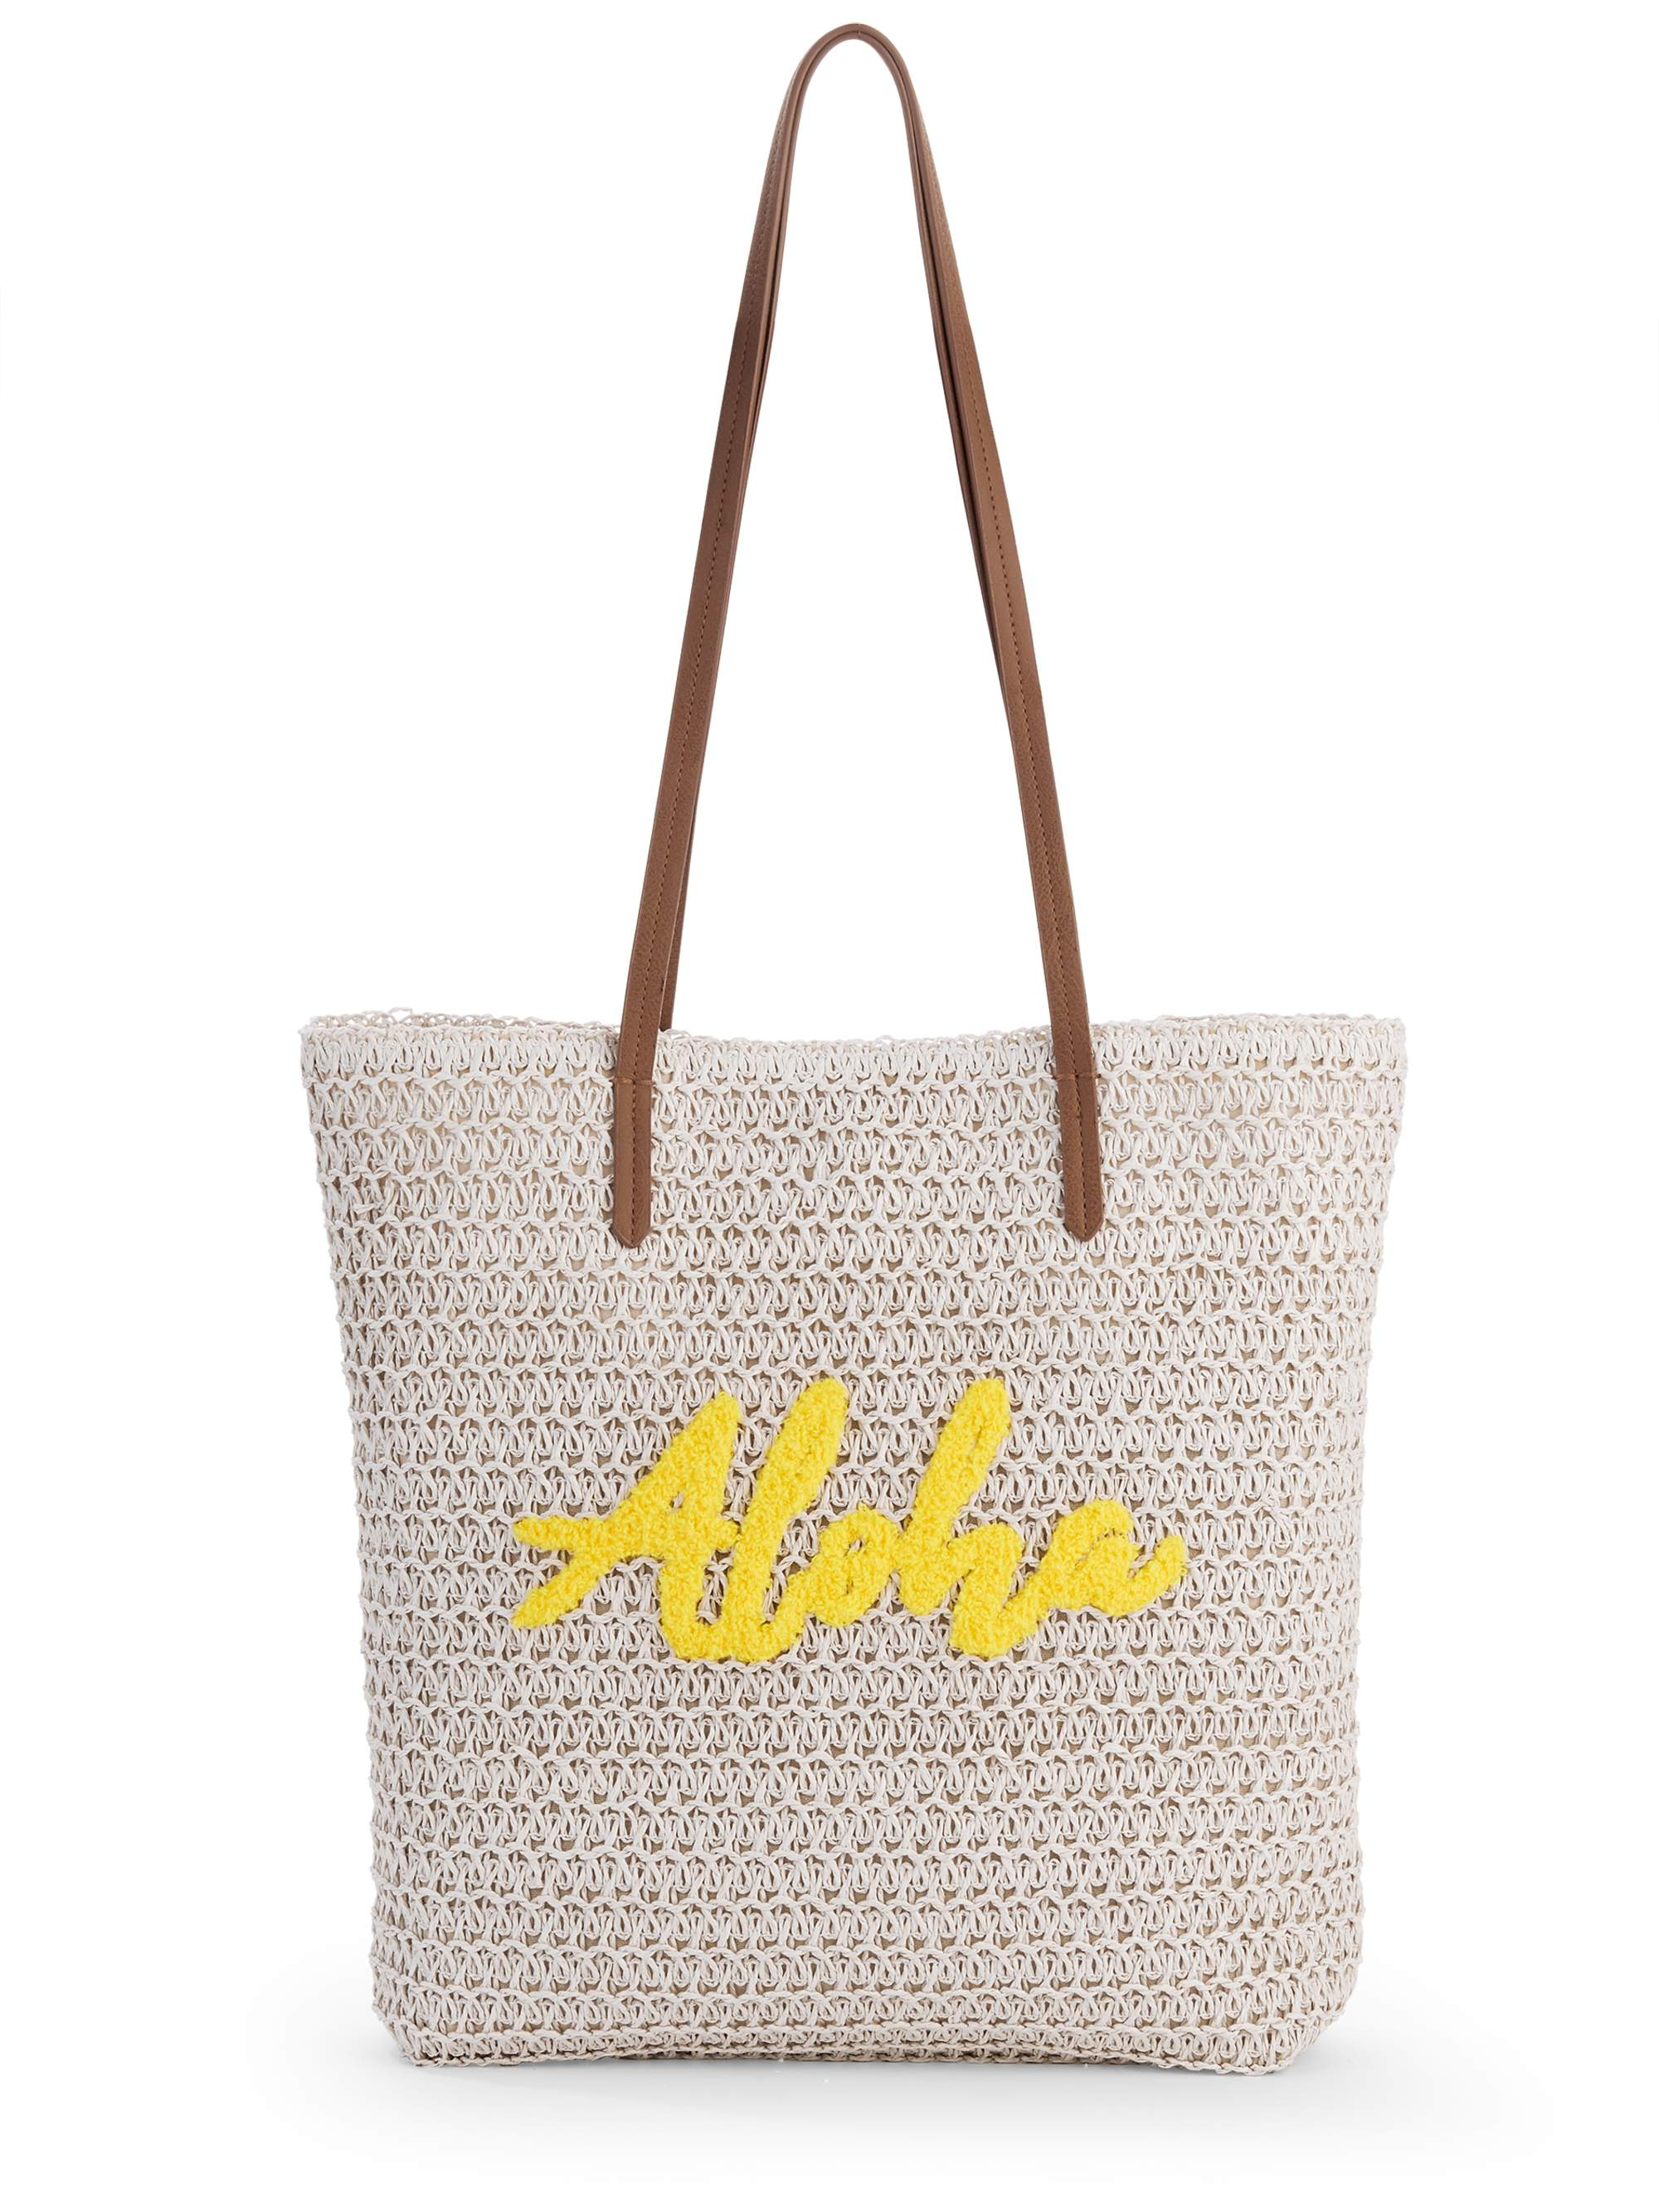 "Time & Tru ""Aloha"" Packable Straw Tote"